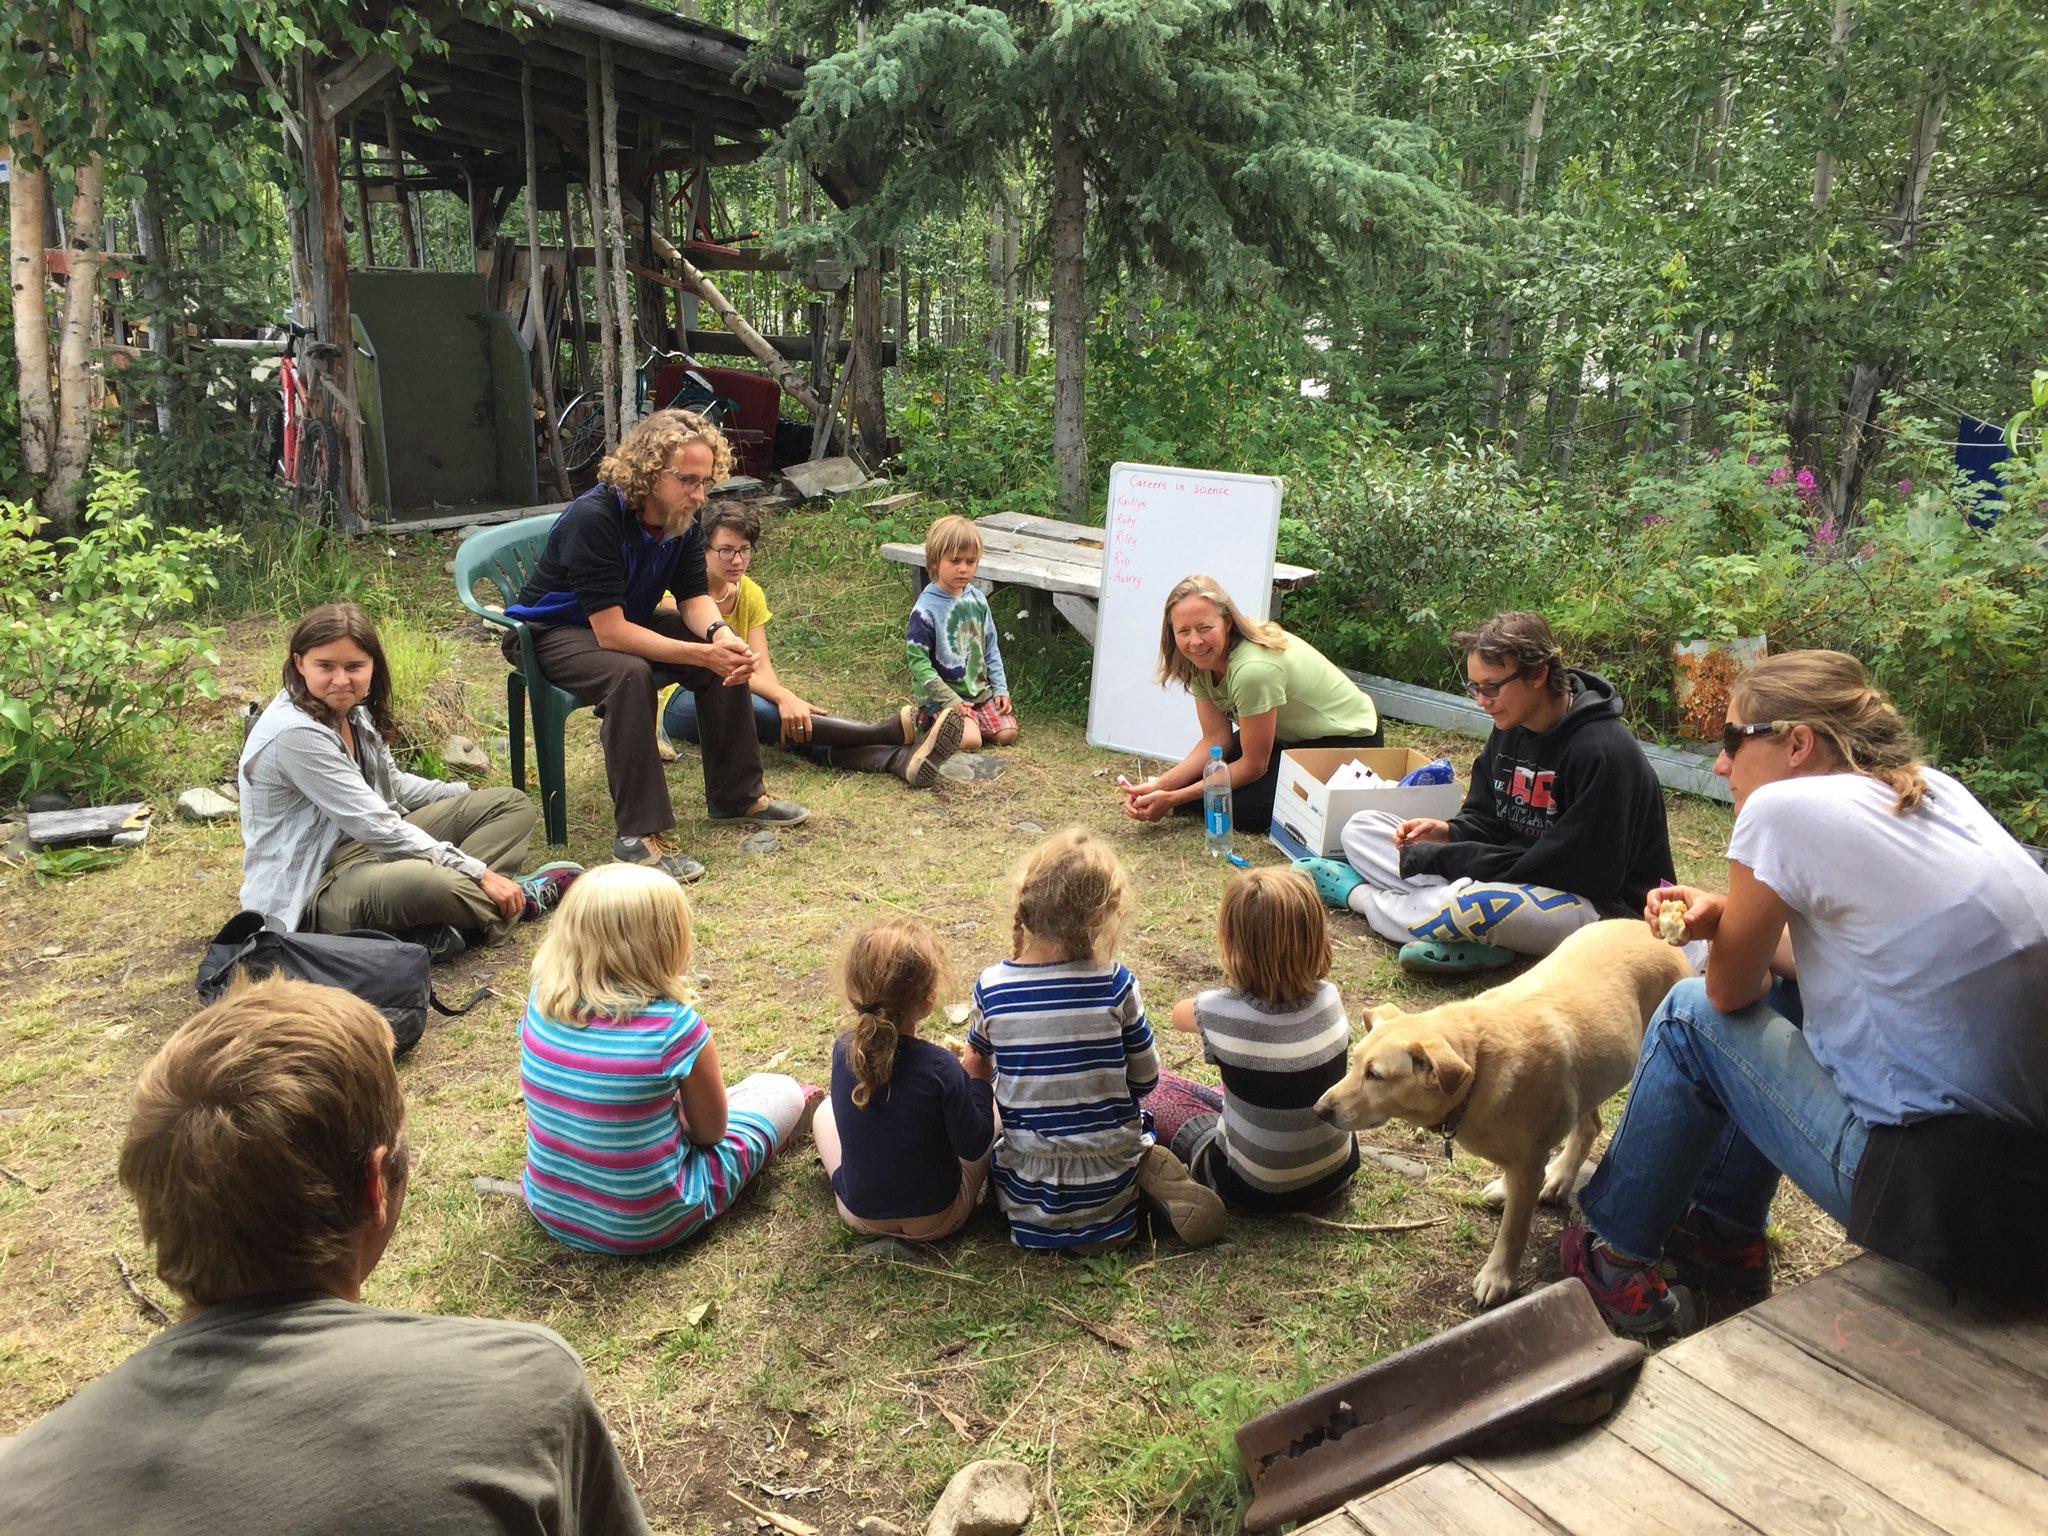 Mountain Science for Youth with Cynthia Shidner - Photo: Lara Applebaum